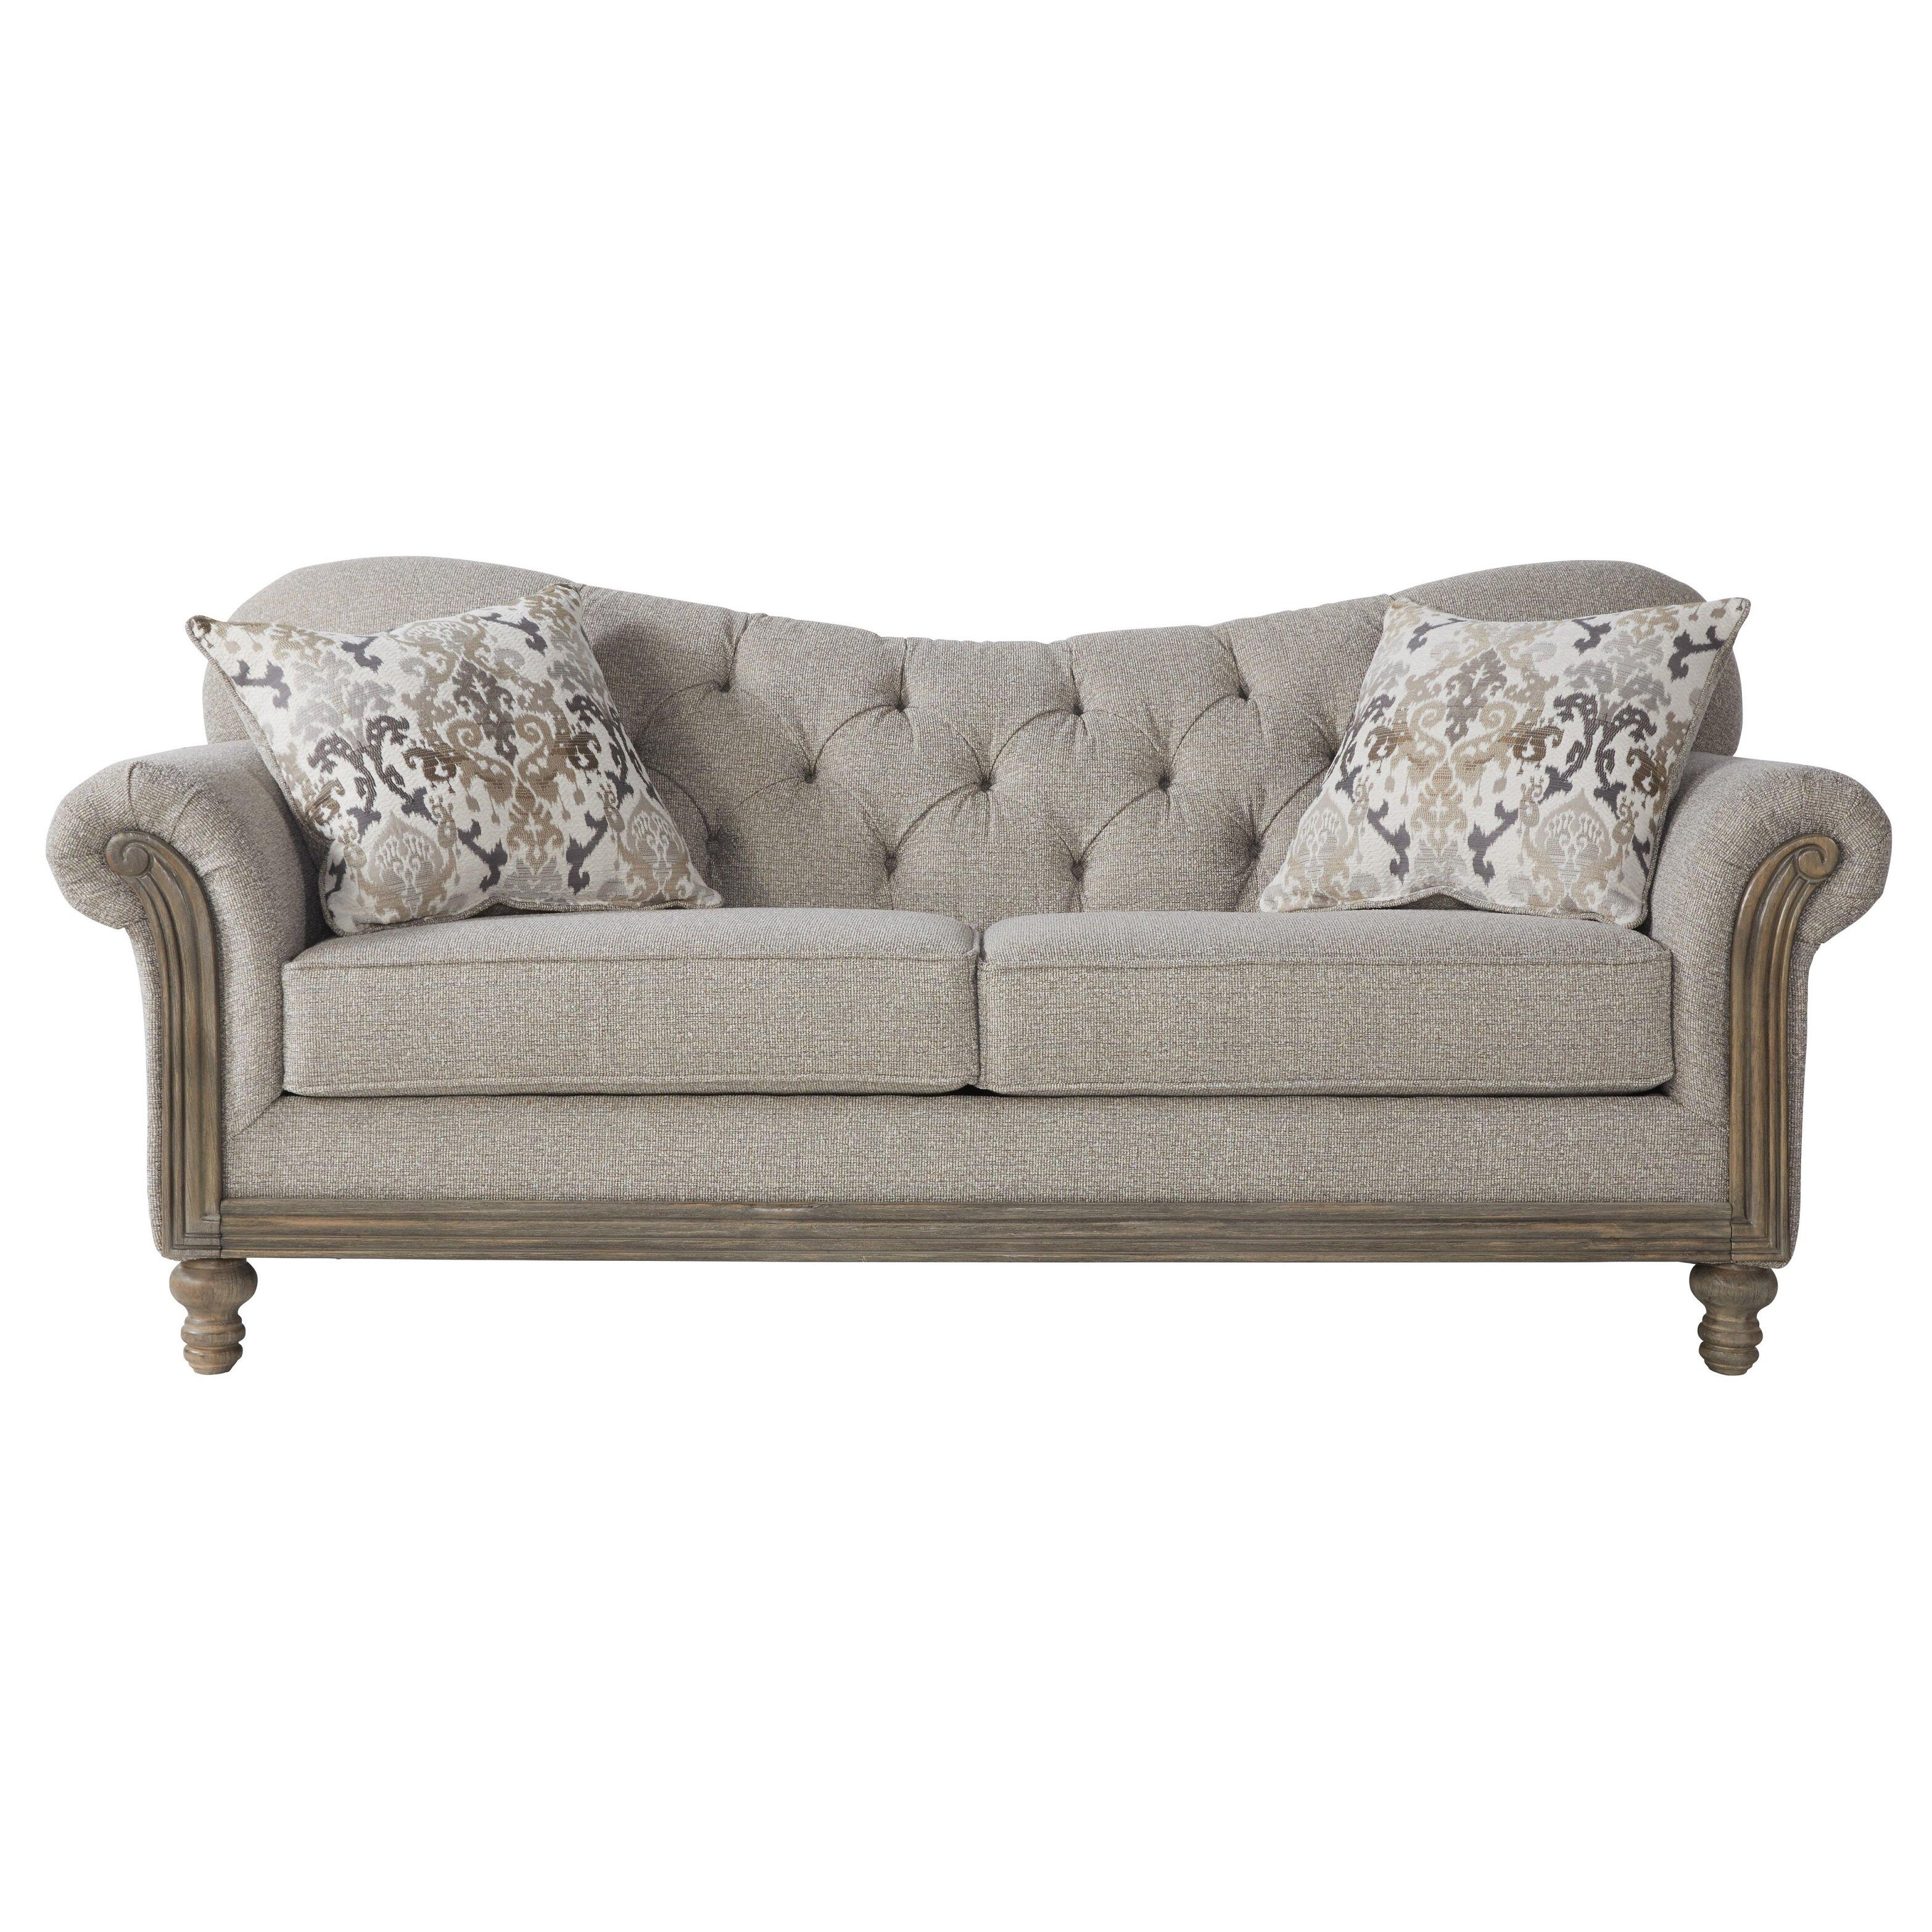 Larrick Fabric Tufted Standard Sofa